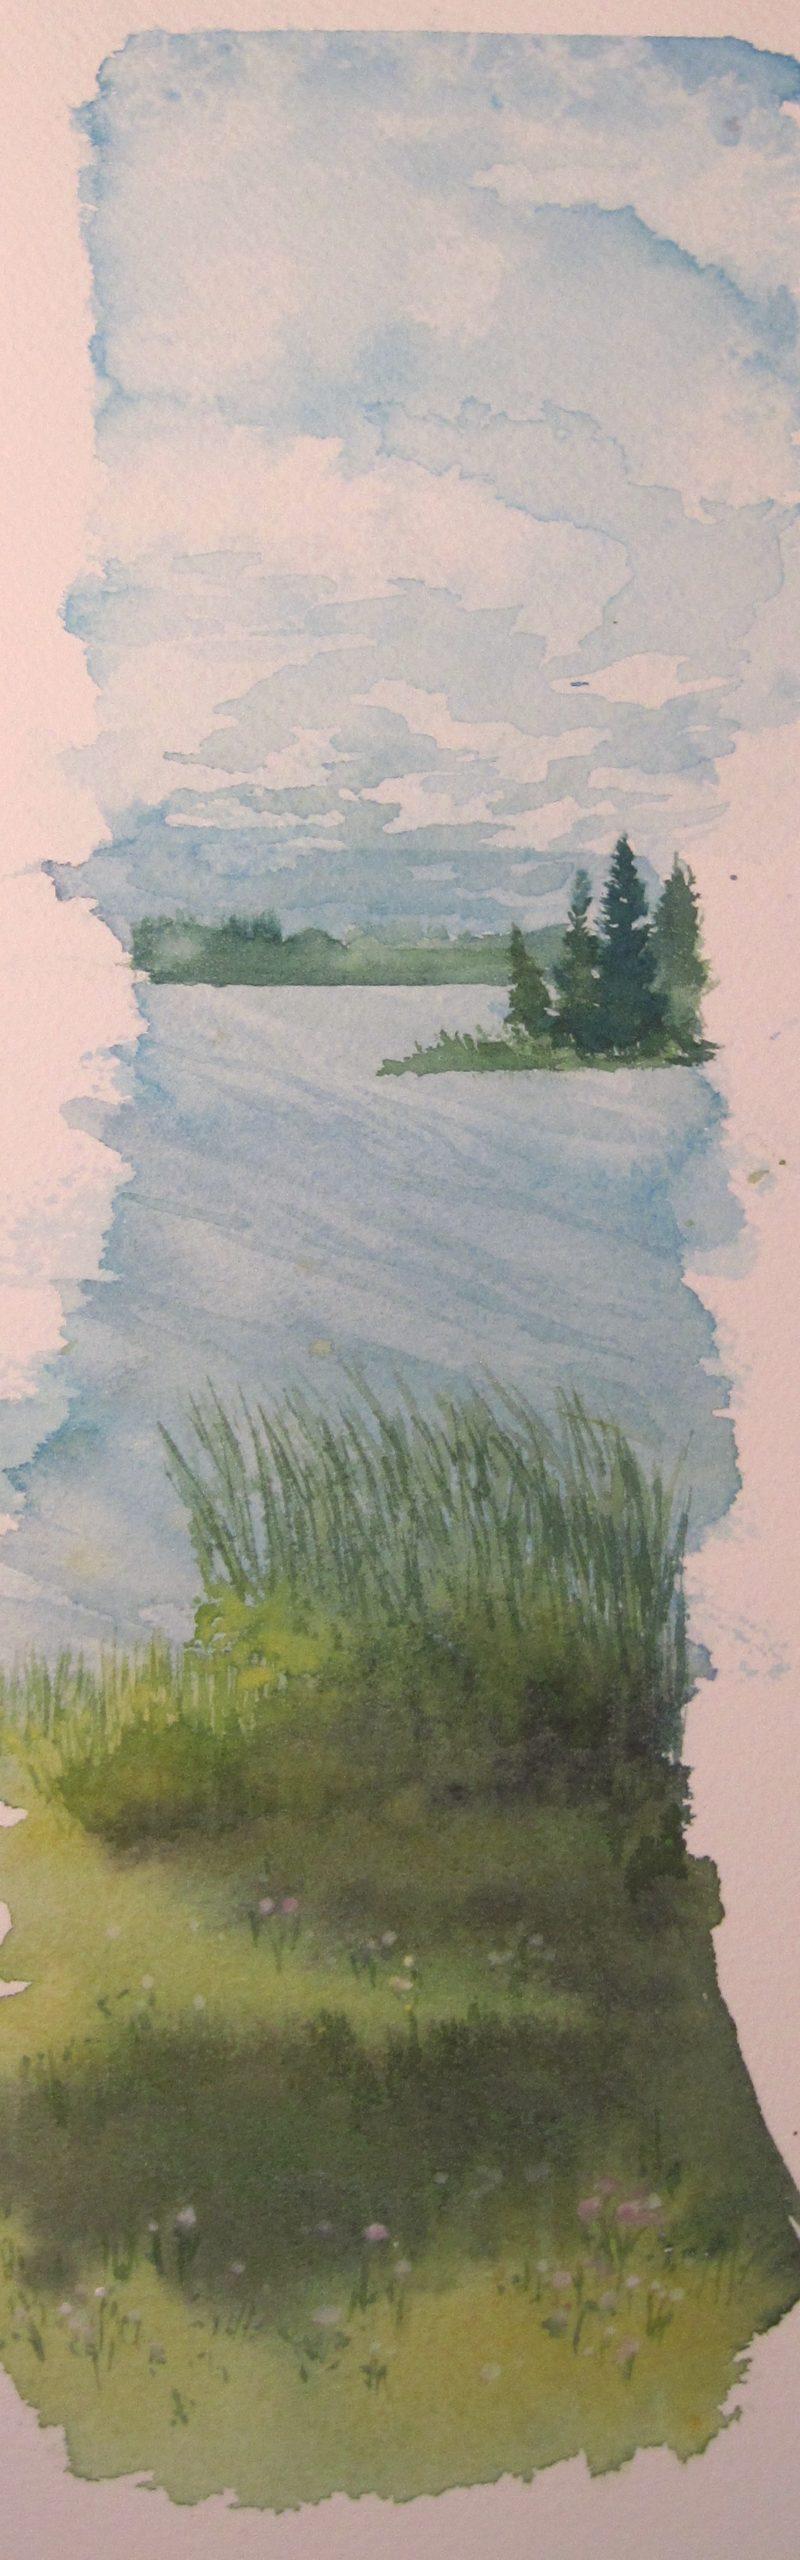 Big Grand Lake 60 Minute Warm Up by Julia Jaakola